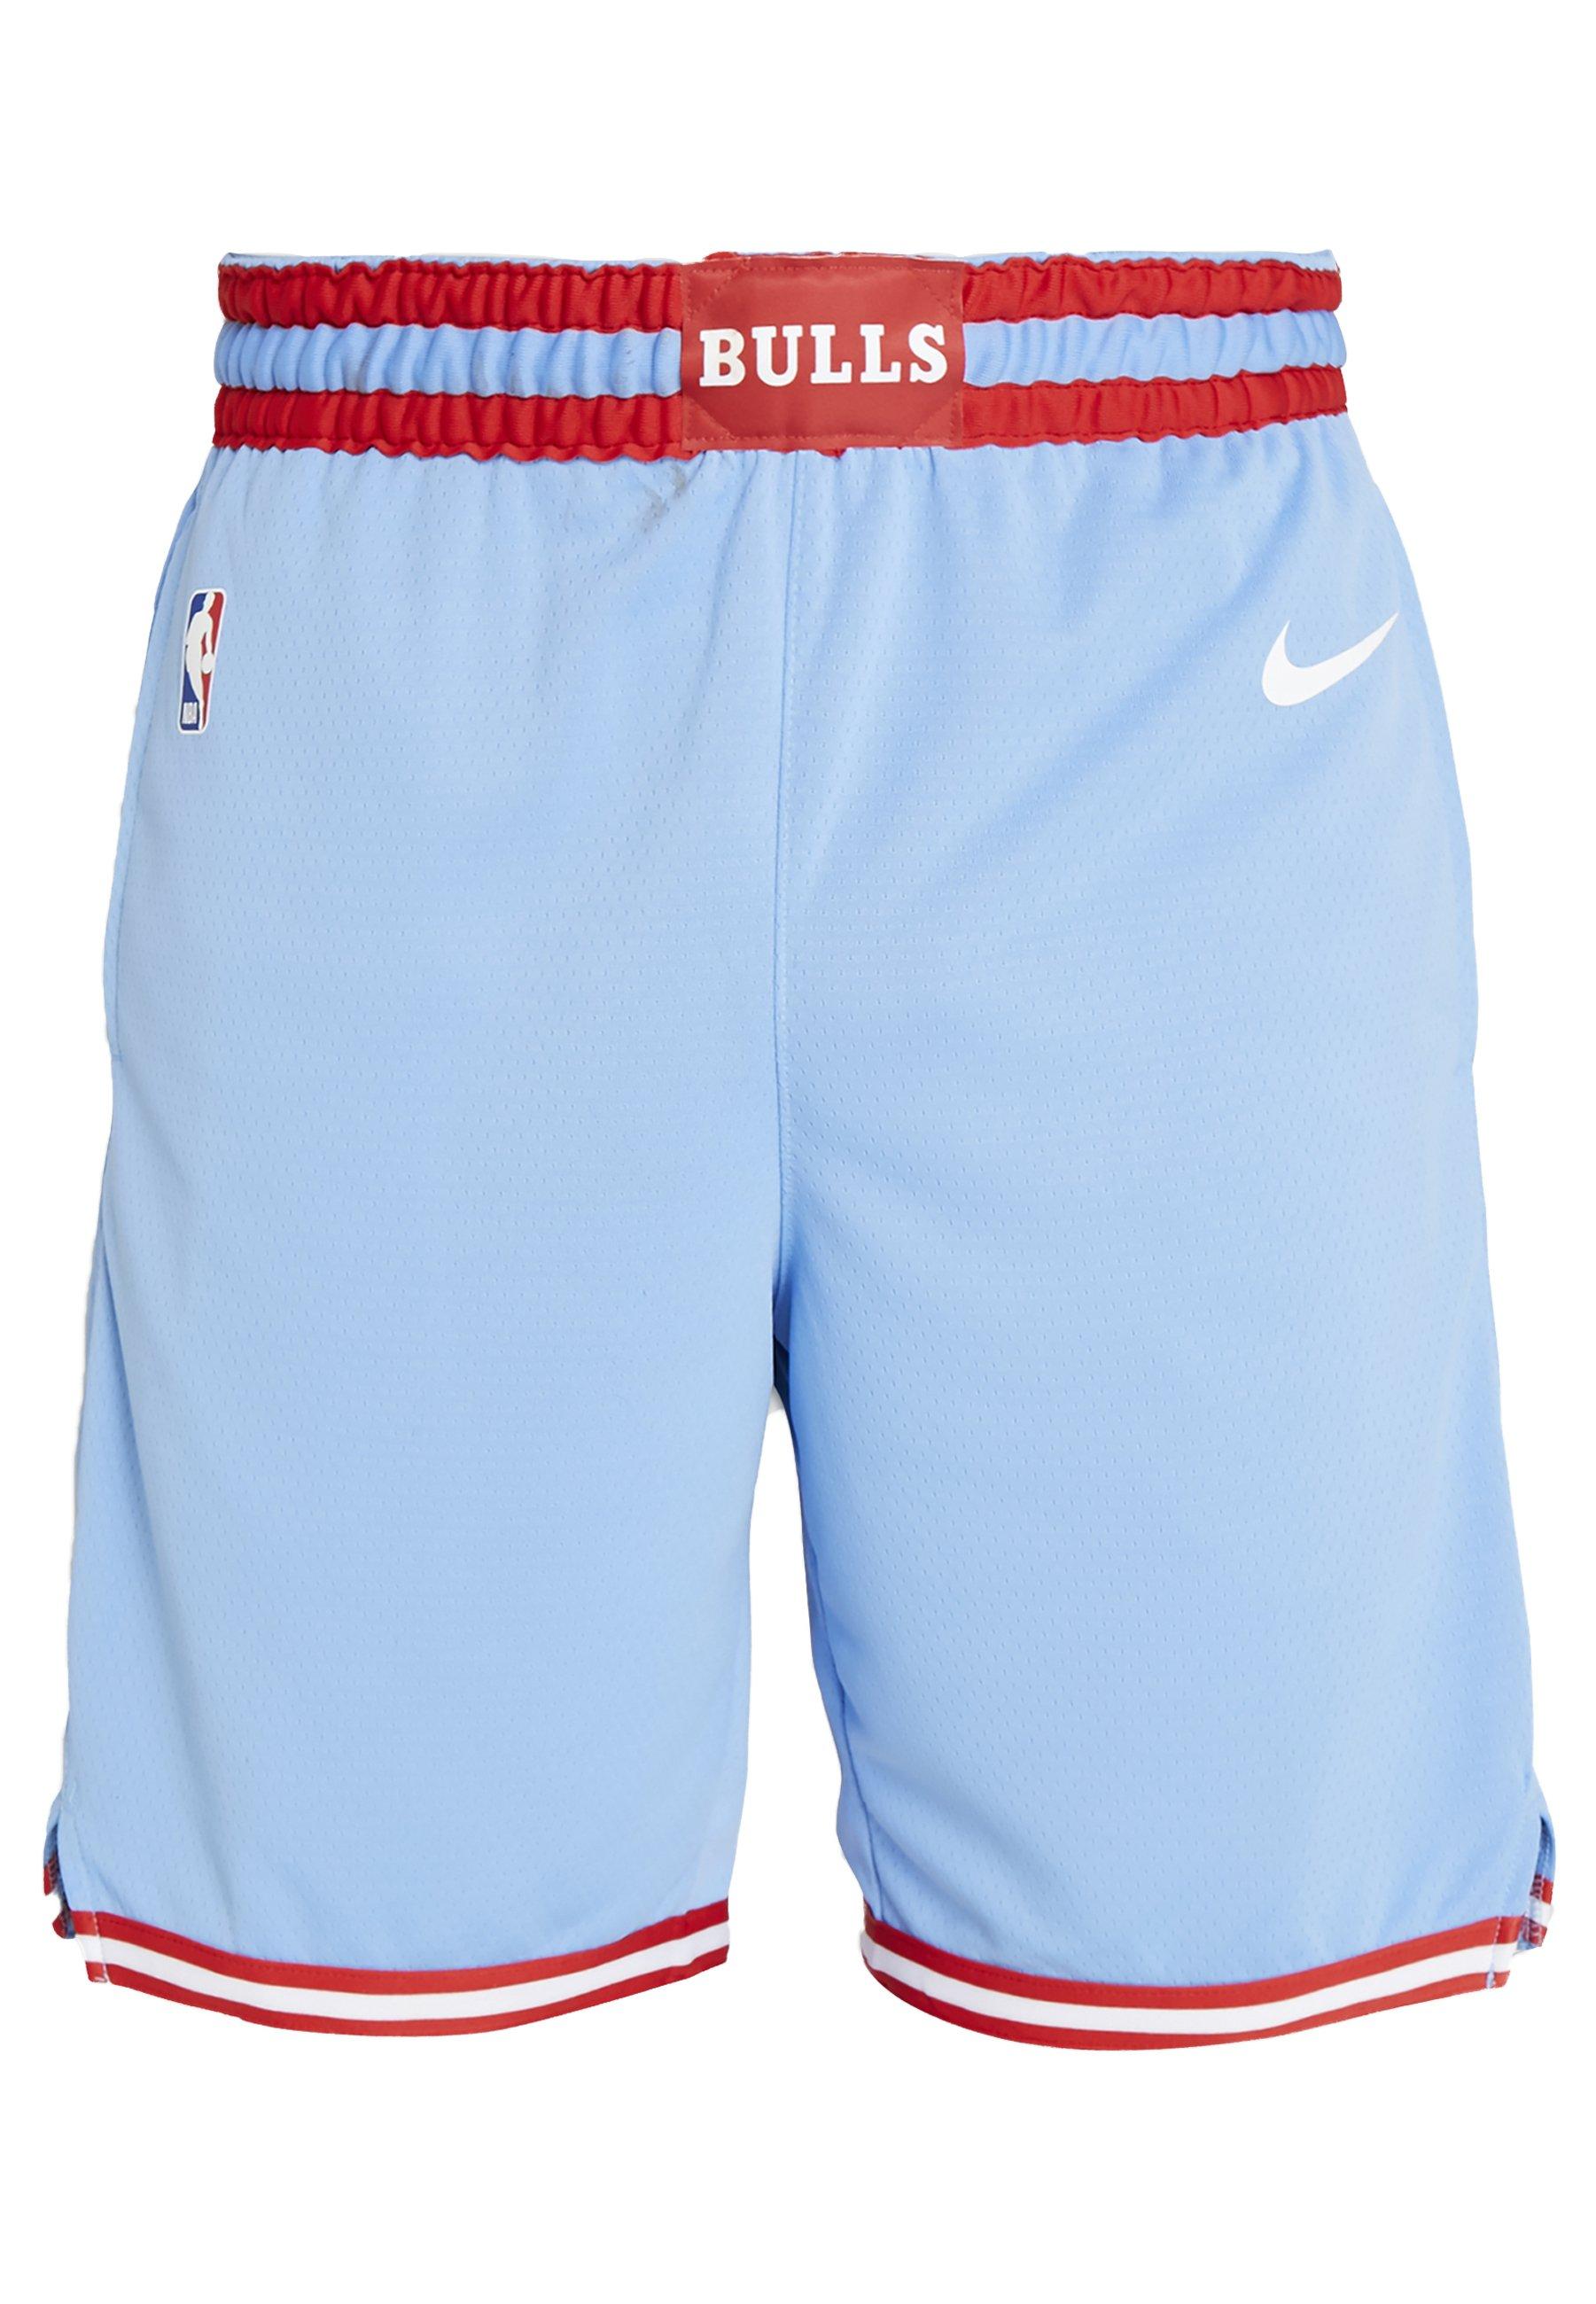 Nike Performance Nba City Edition Chicago Bulls Swingman Short - Träningsshorts Valor Blue/white